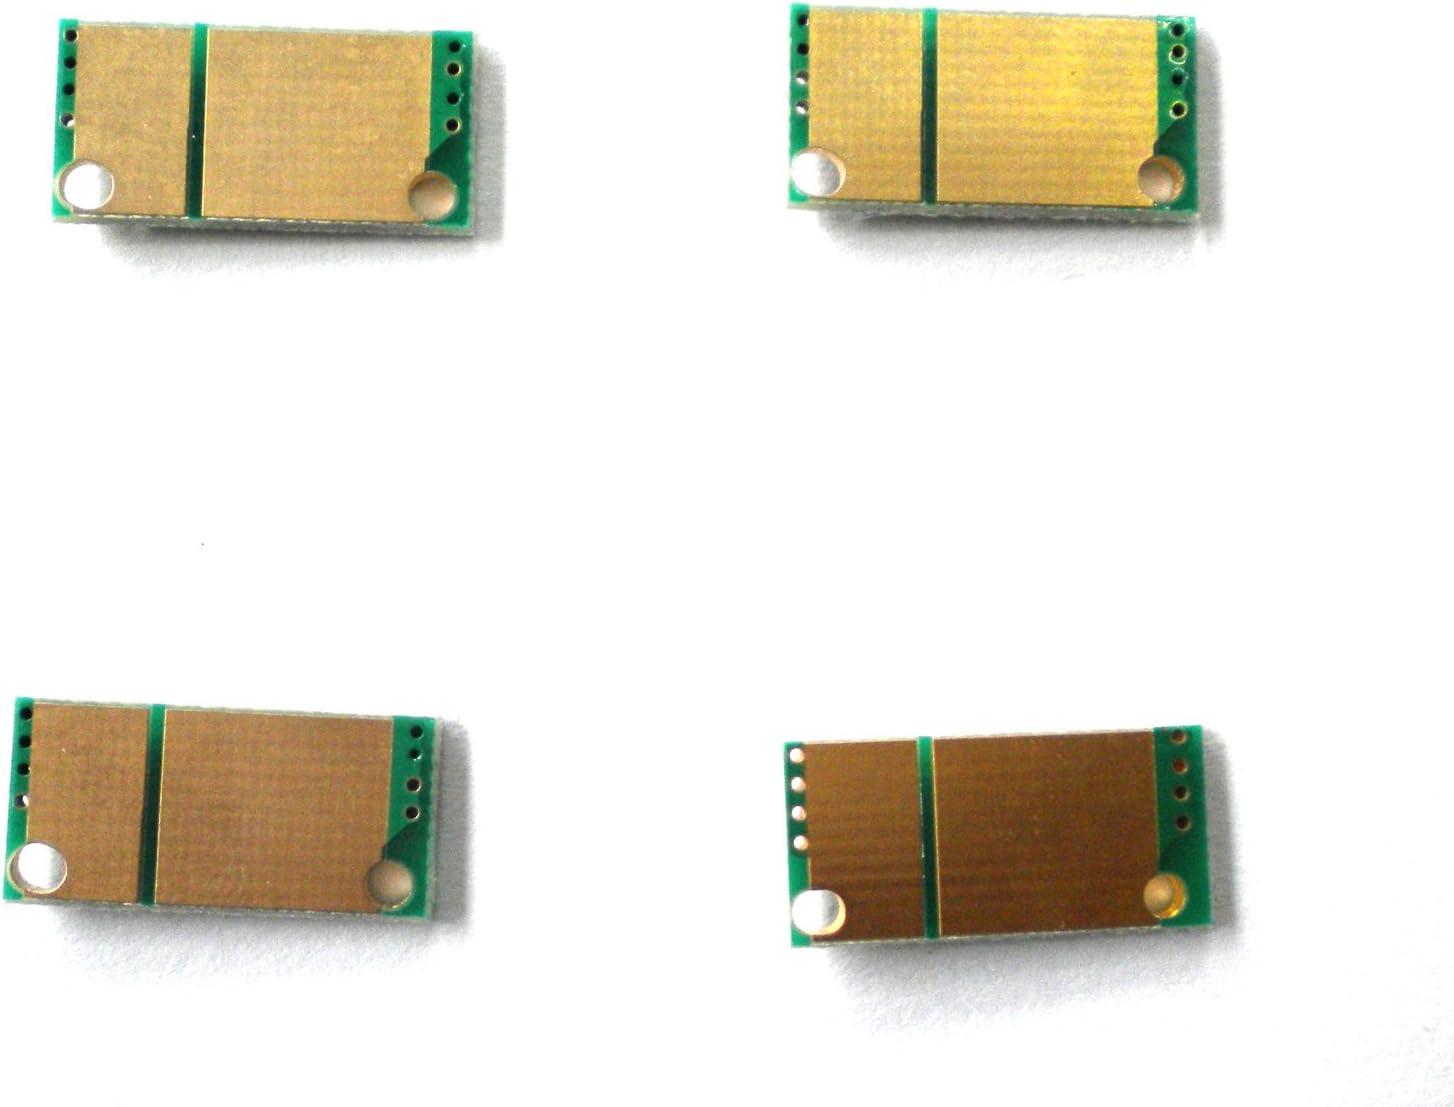 652 ineo ineo Reset Chip Cyan Develop ineo+452 552